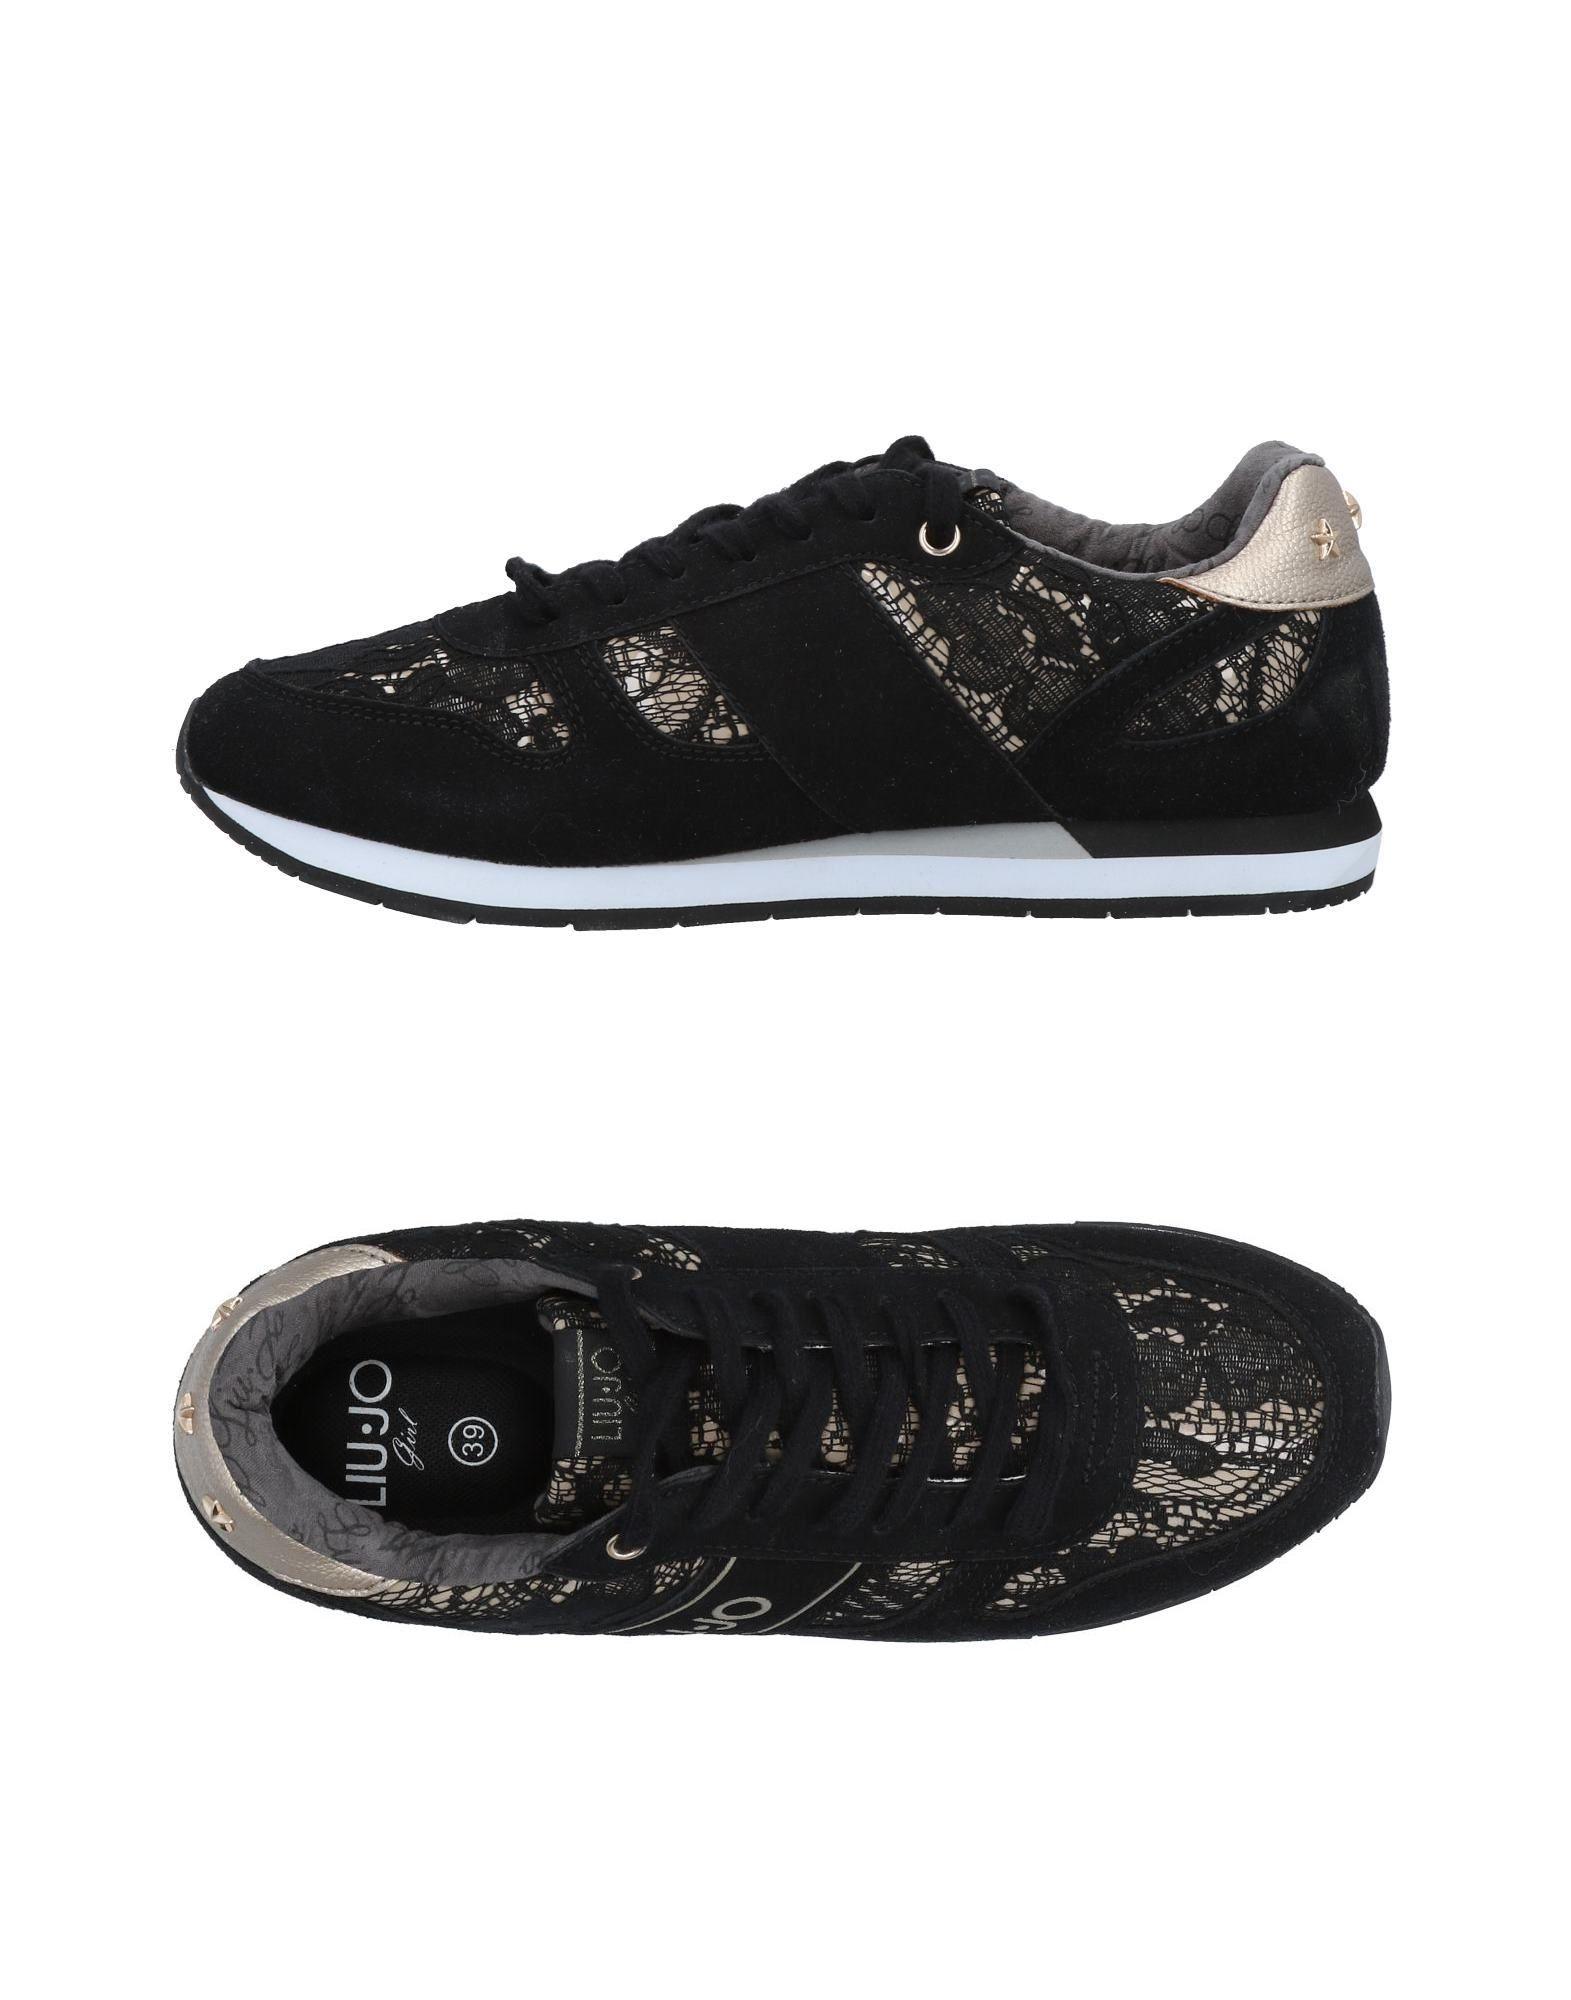 LIU •JO Низкие кеды и кроссовки liu •jo shoes низкие кеды и кроссовки